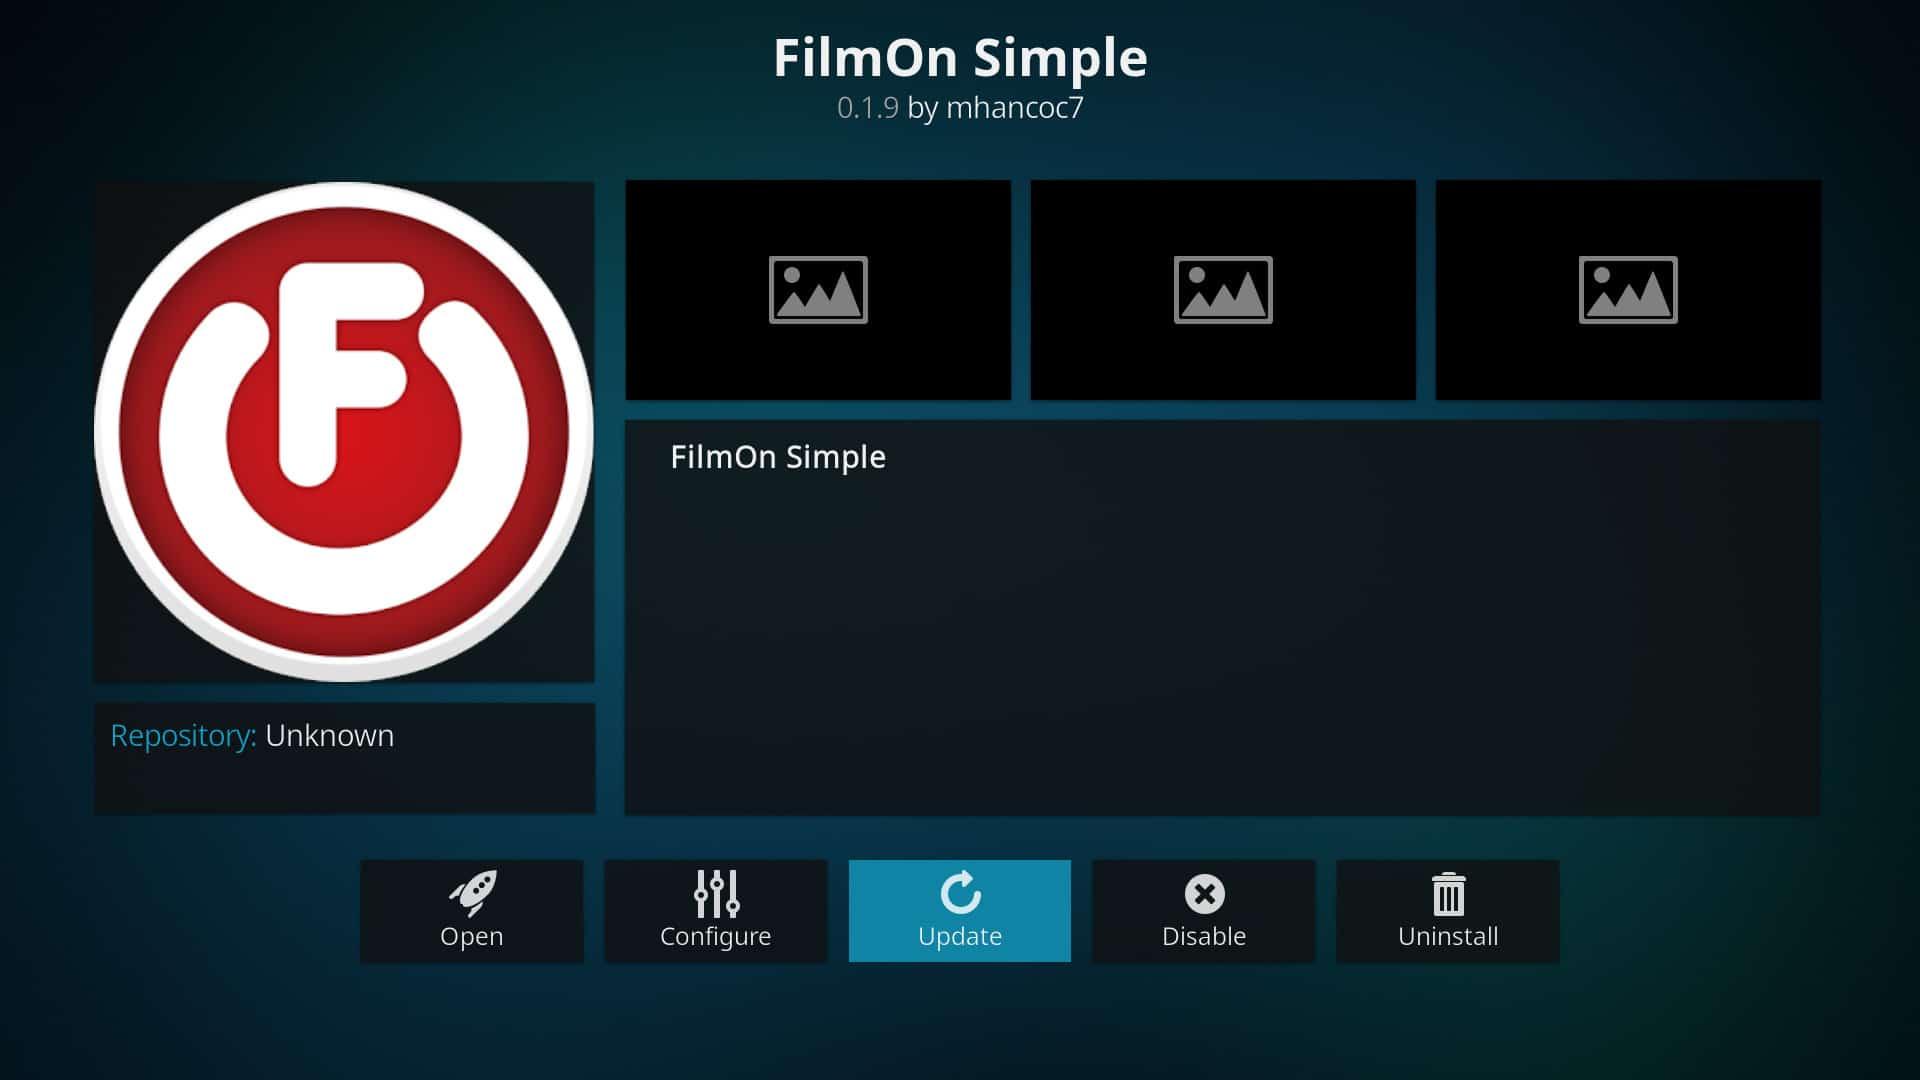 FilmOn Kodi Addon  How to install and watch FilmOn on Kodi bc31e68723d73